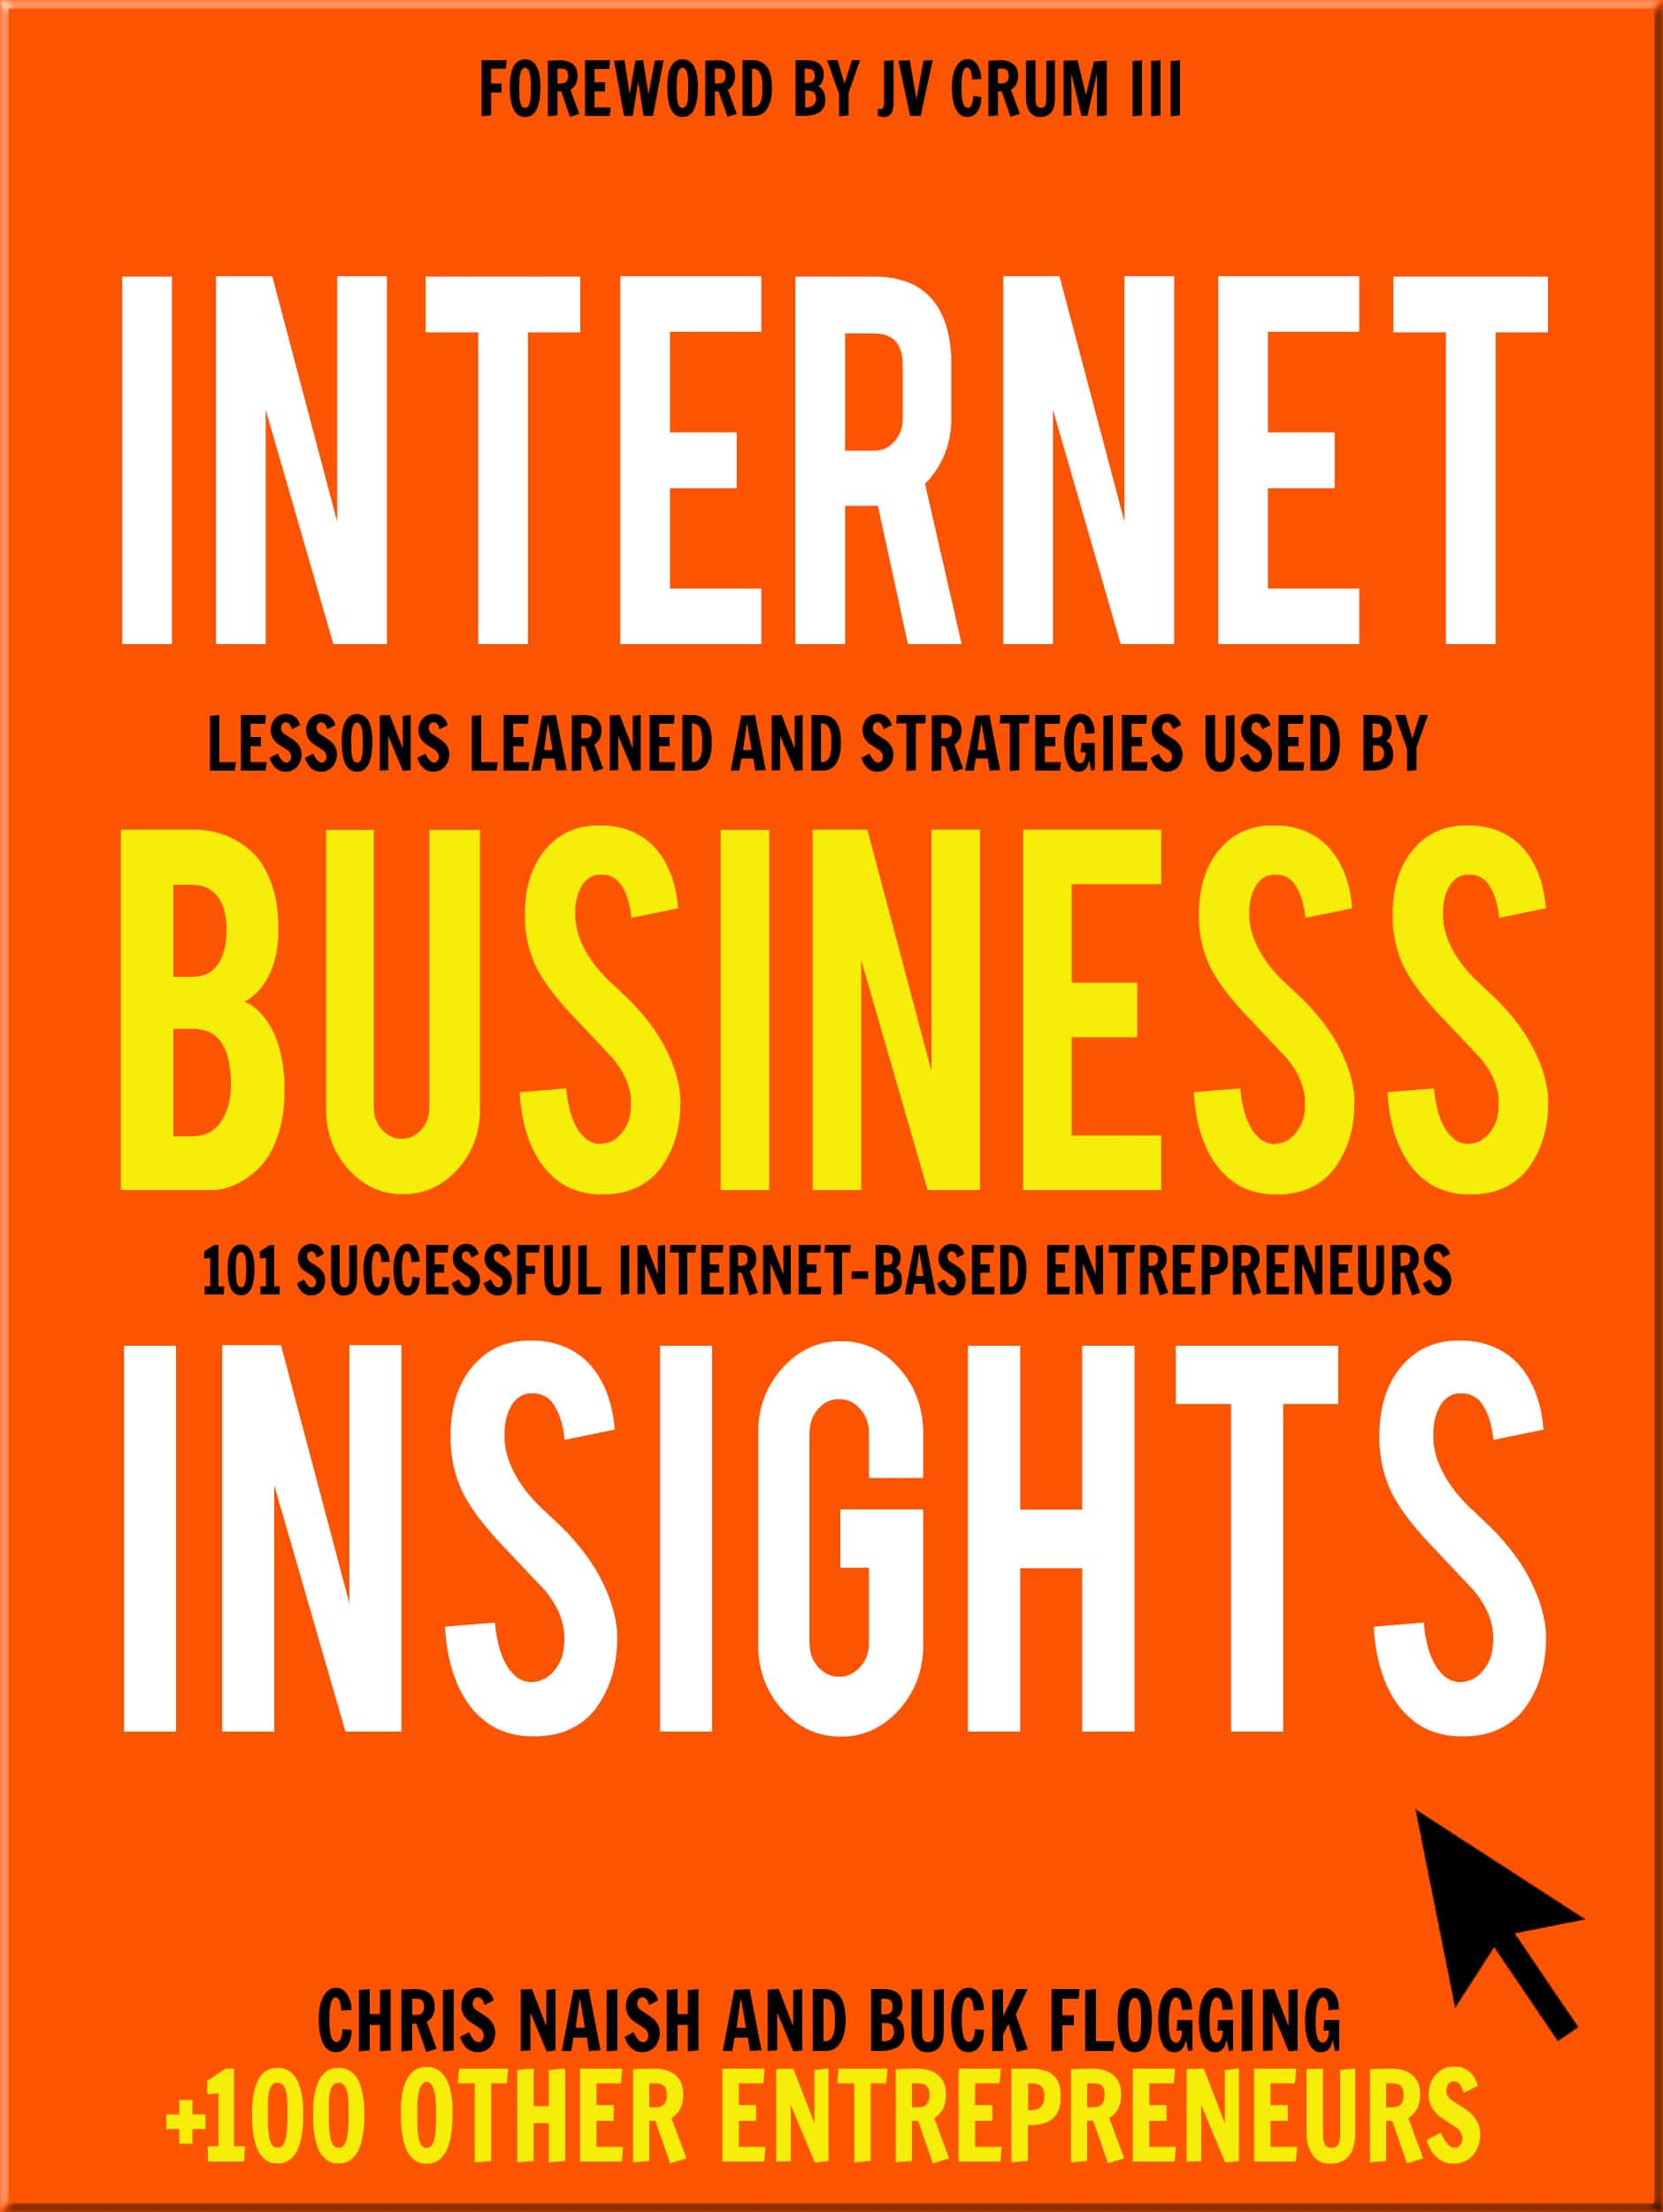 Internet Business Insights Book